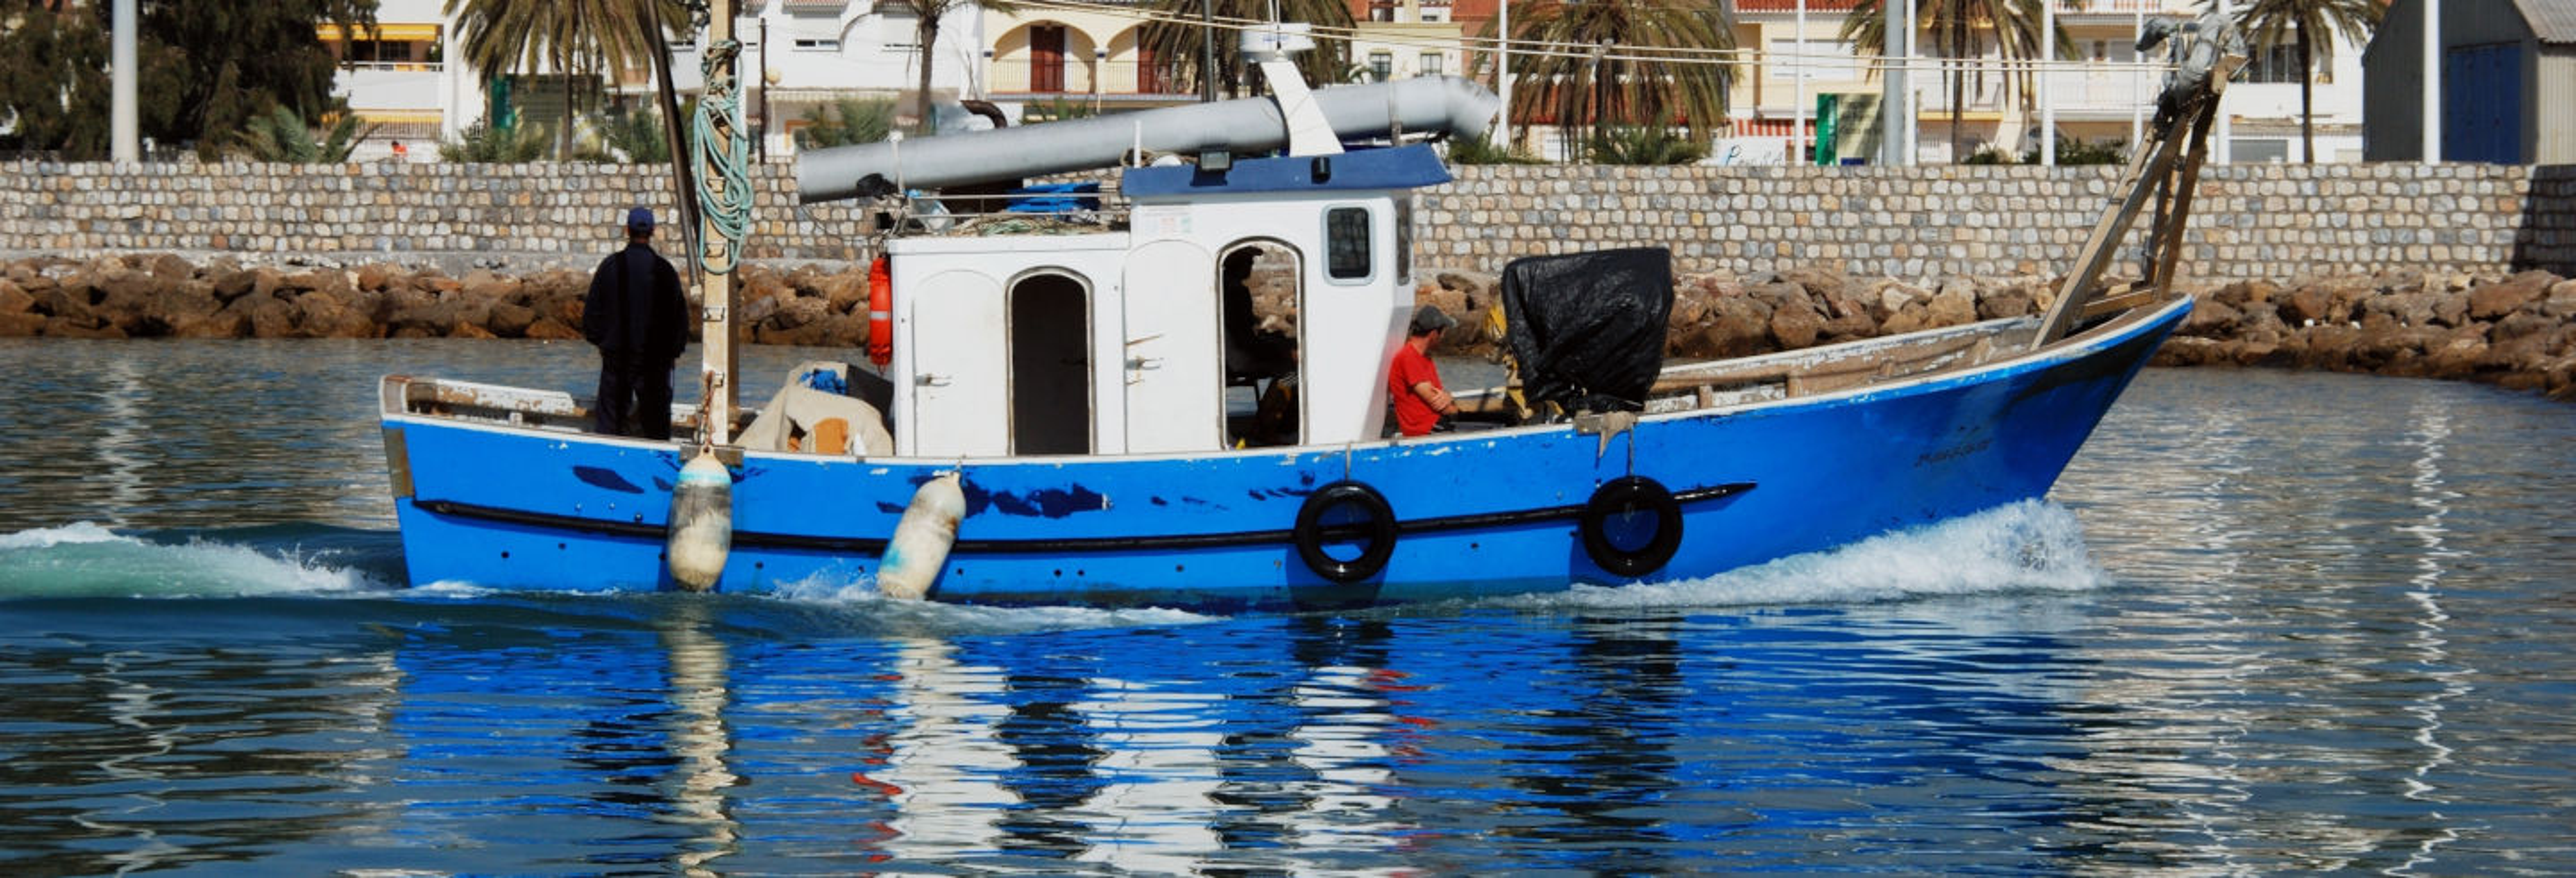 Mediterranean Boat Cruise